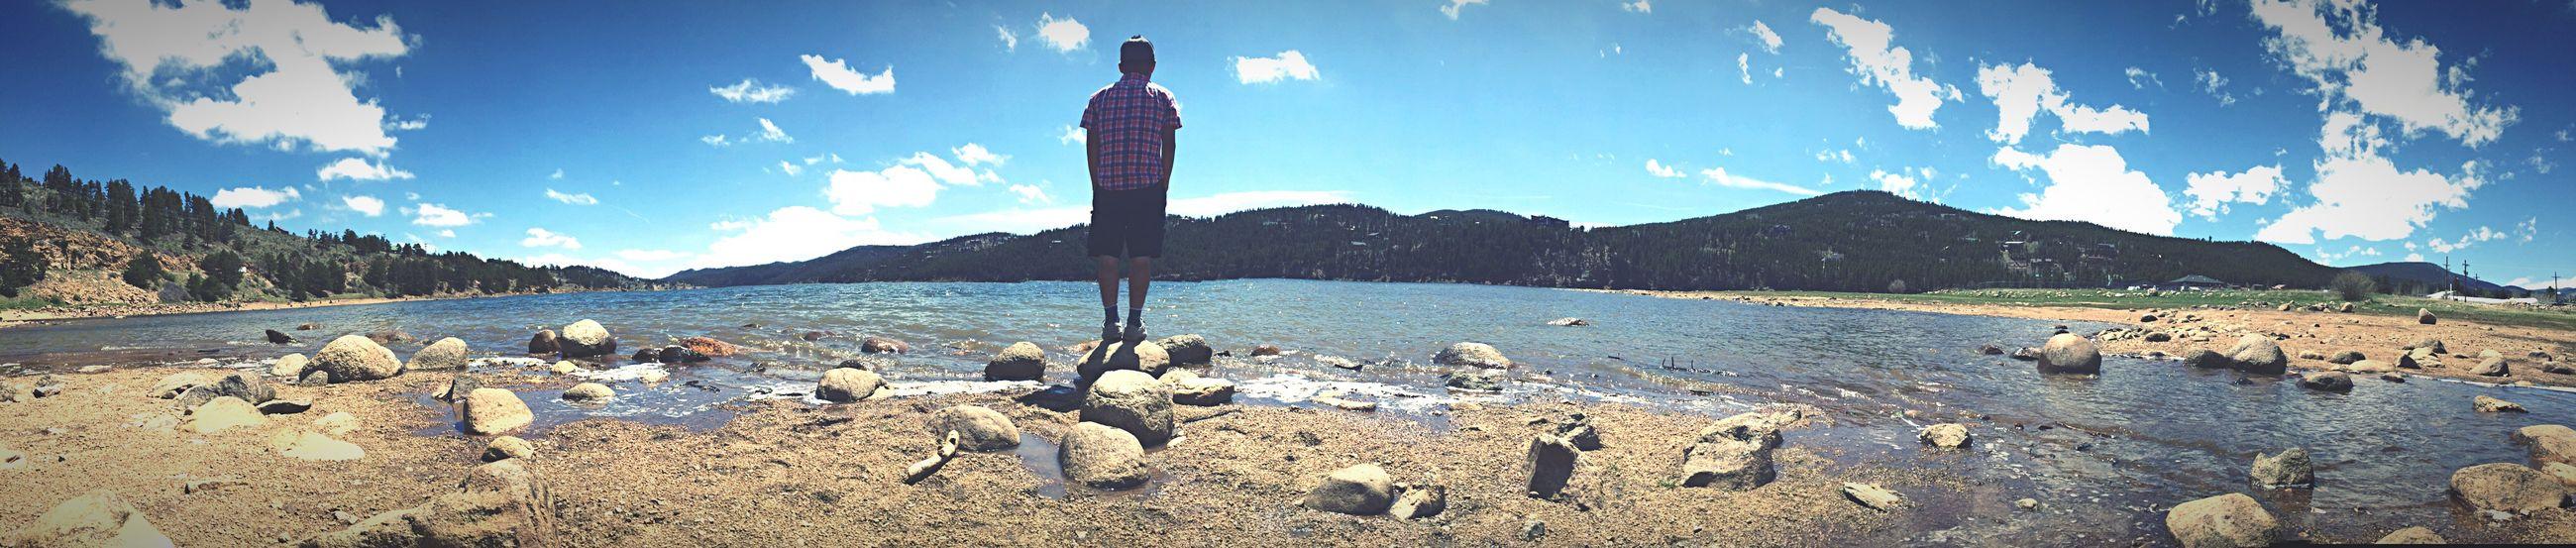 I don't even think my boyfriend knows i took this. Boyfriend❤ Nederland Colorado Lake View Mountains Adventure Nature Nederland Colorado